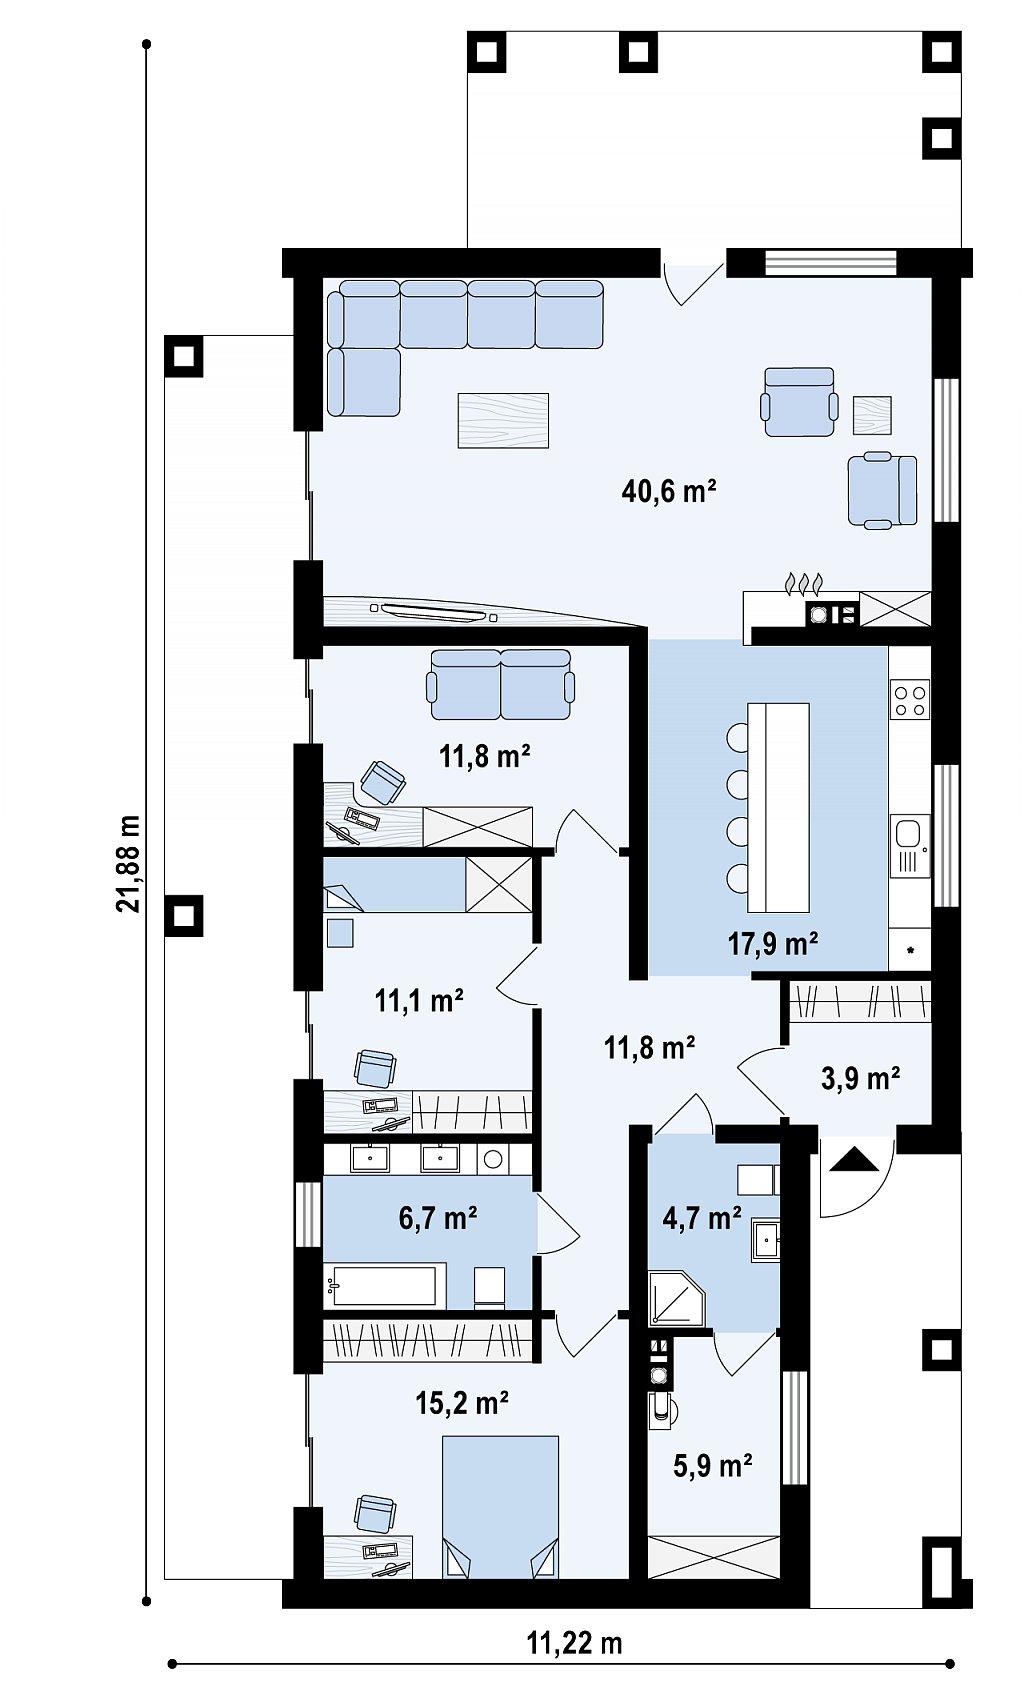 Проект для узкого участка без гаража с тремя спальнями план помещений 1